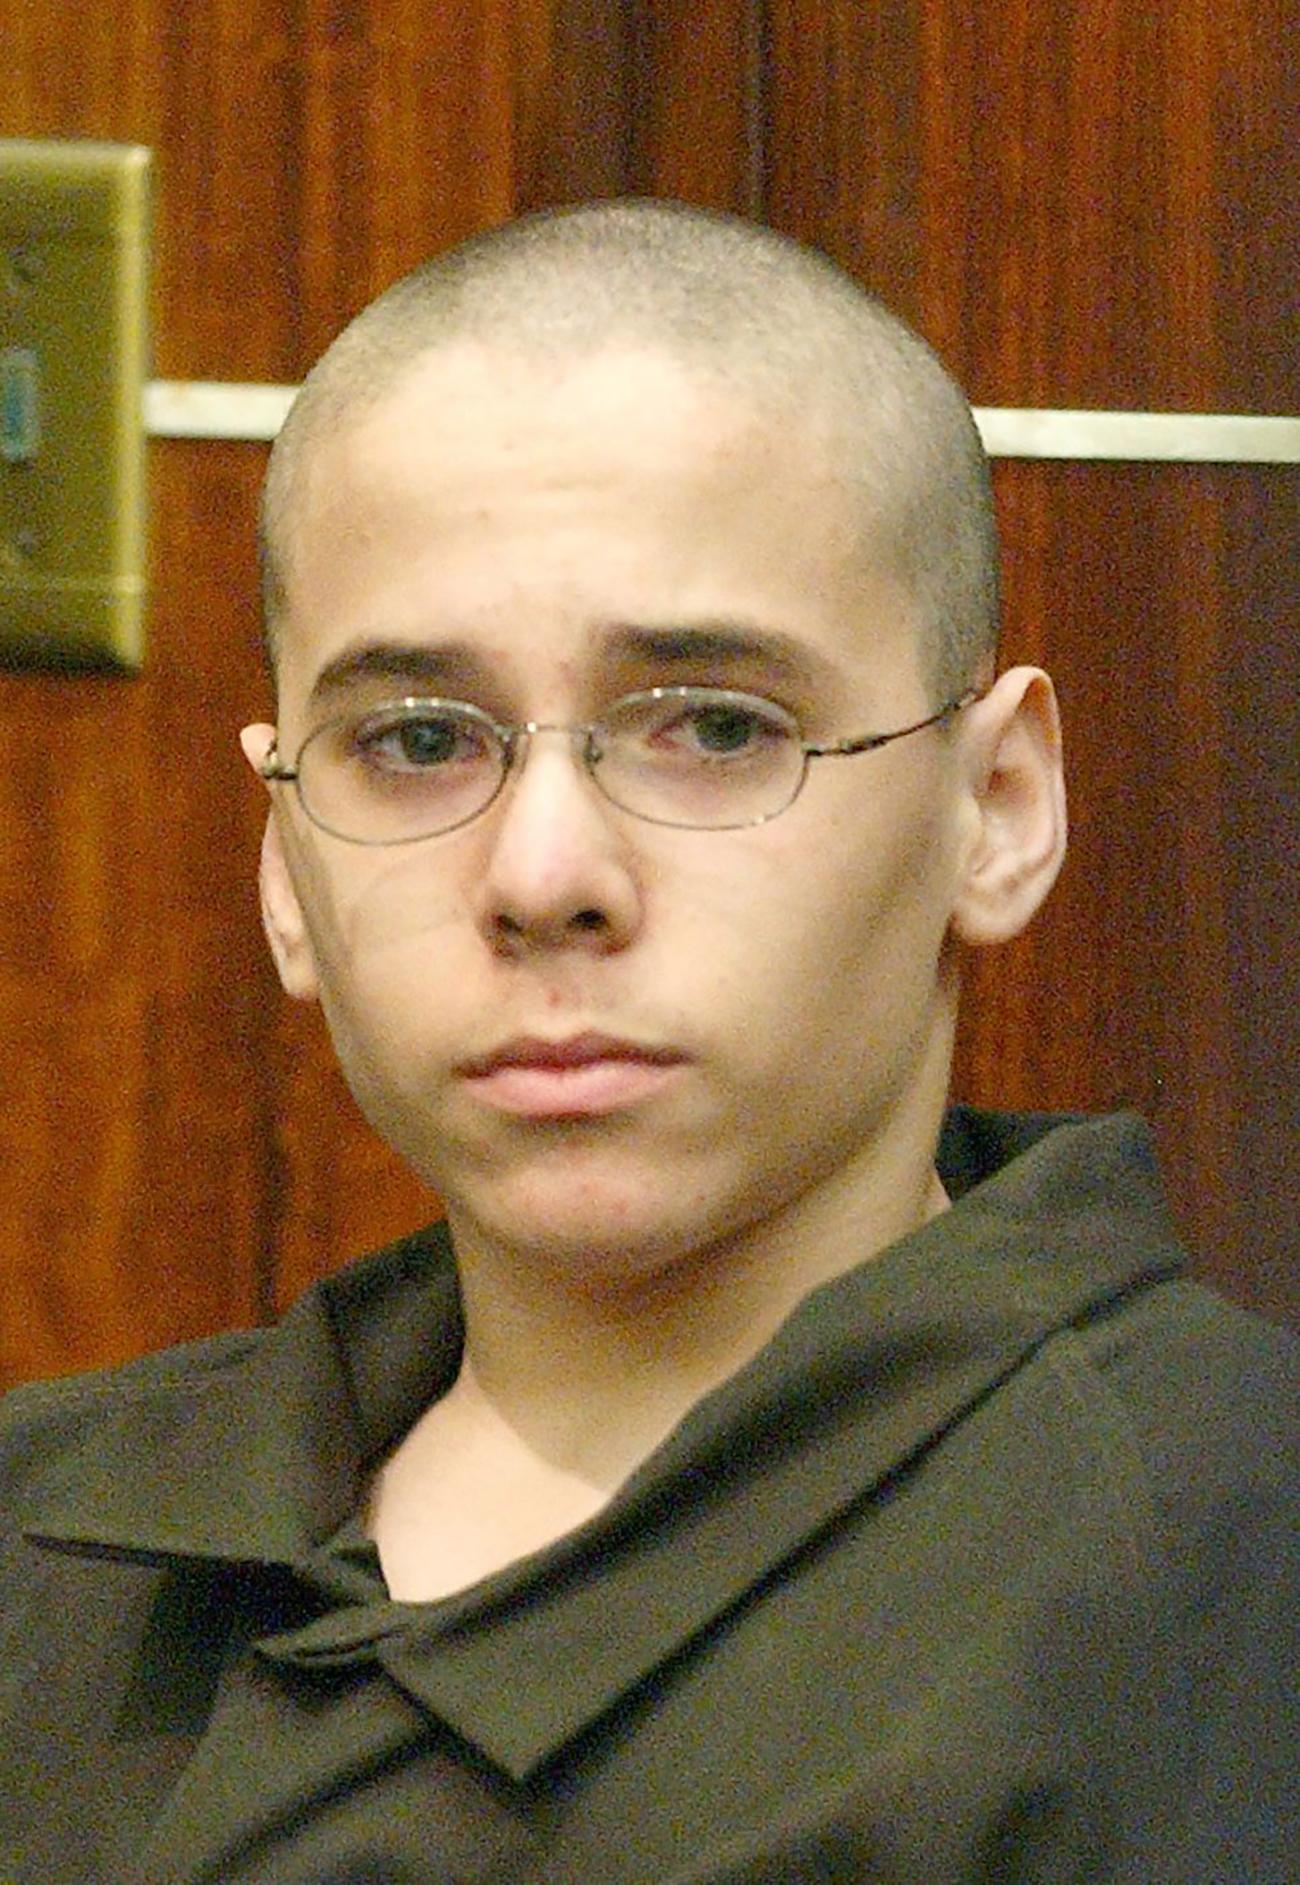 Michael Hernandez - Student Slain, MIAMI, USA